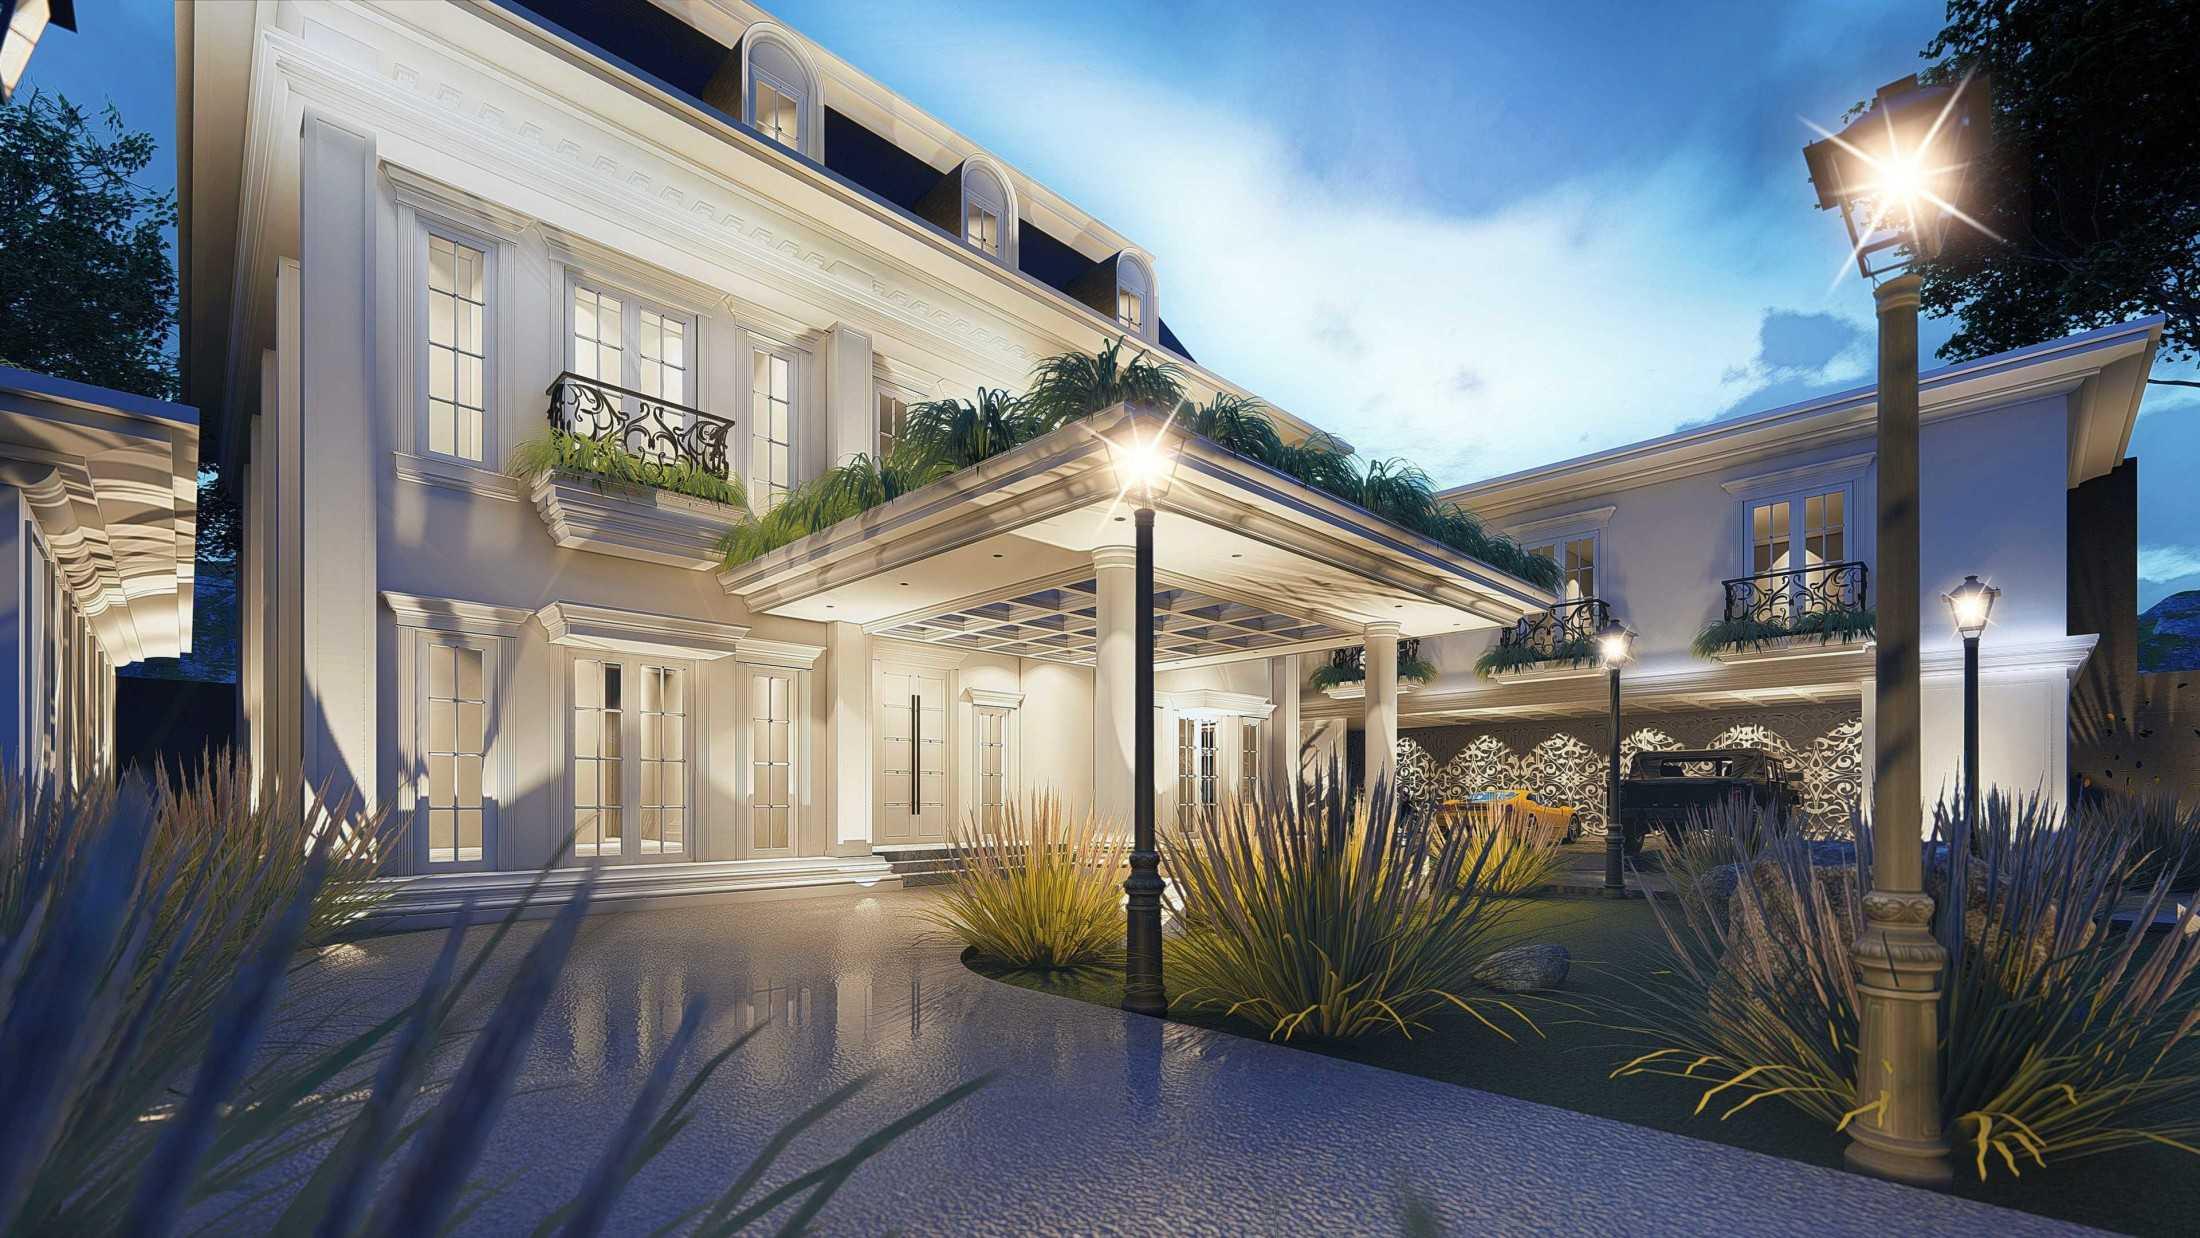 Mahastudio & Partner Hidden Palace House Bogor, Jawa Barat, Indonesia Bogor, Jawa Barat, Indonesia Denah Lt.3 Klasik 59877